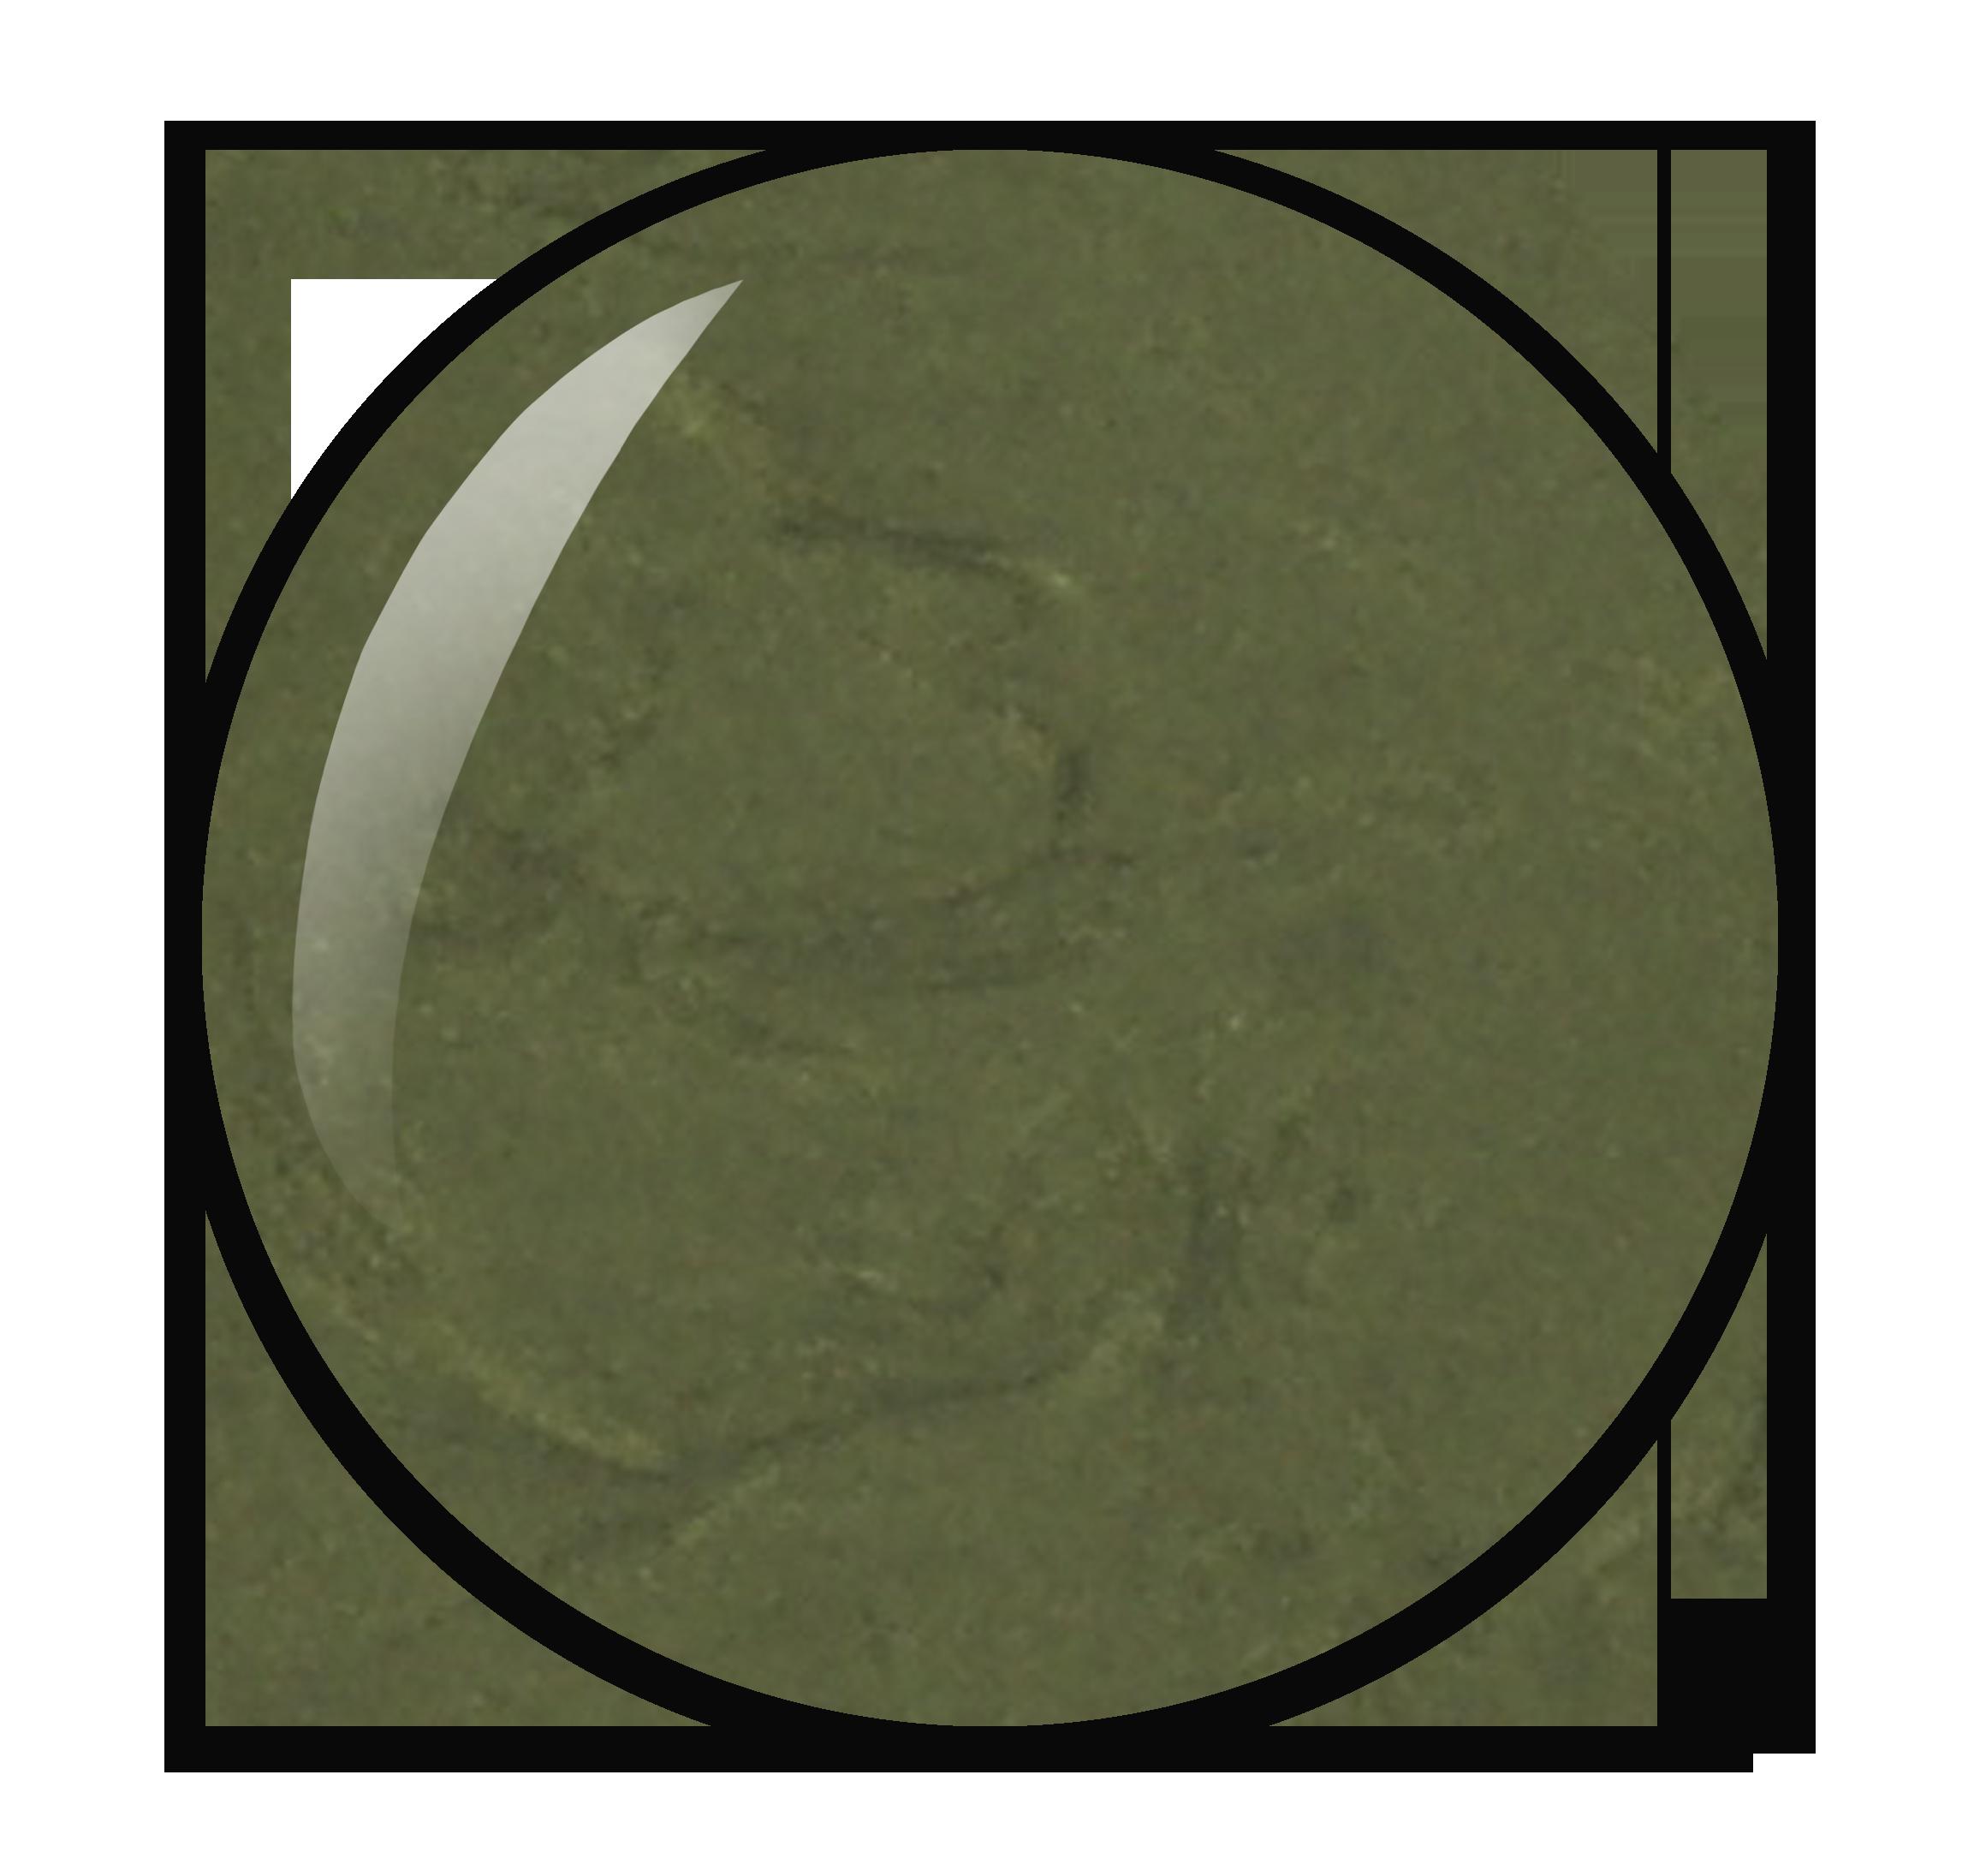 Metallic groene nagellak kleurnummer 63 uit Herôme nagellak collectie